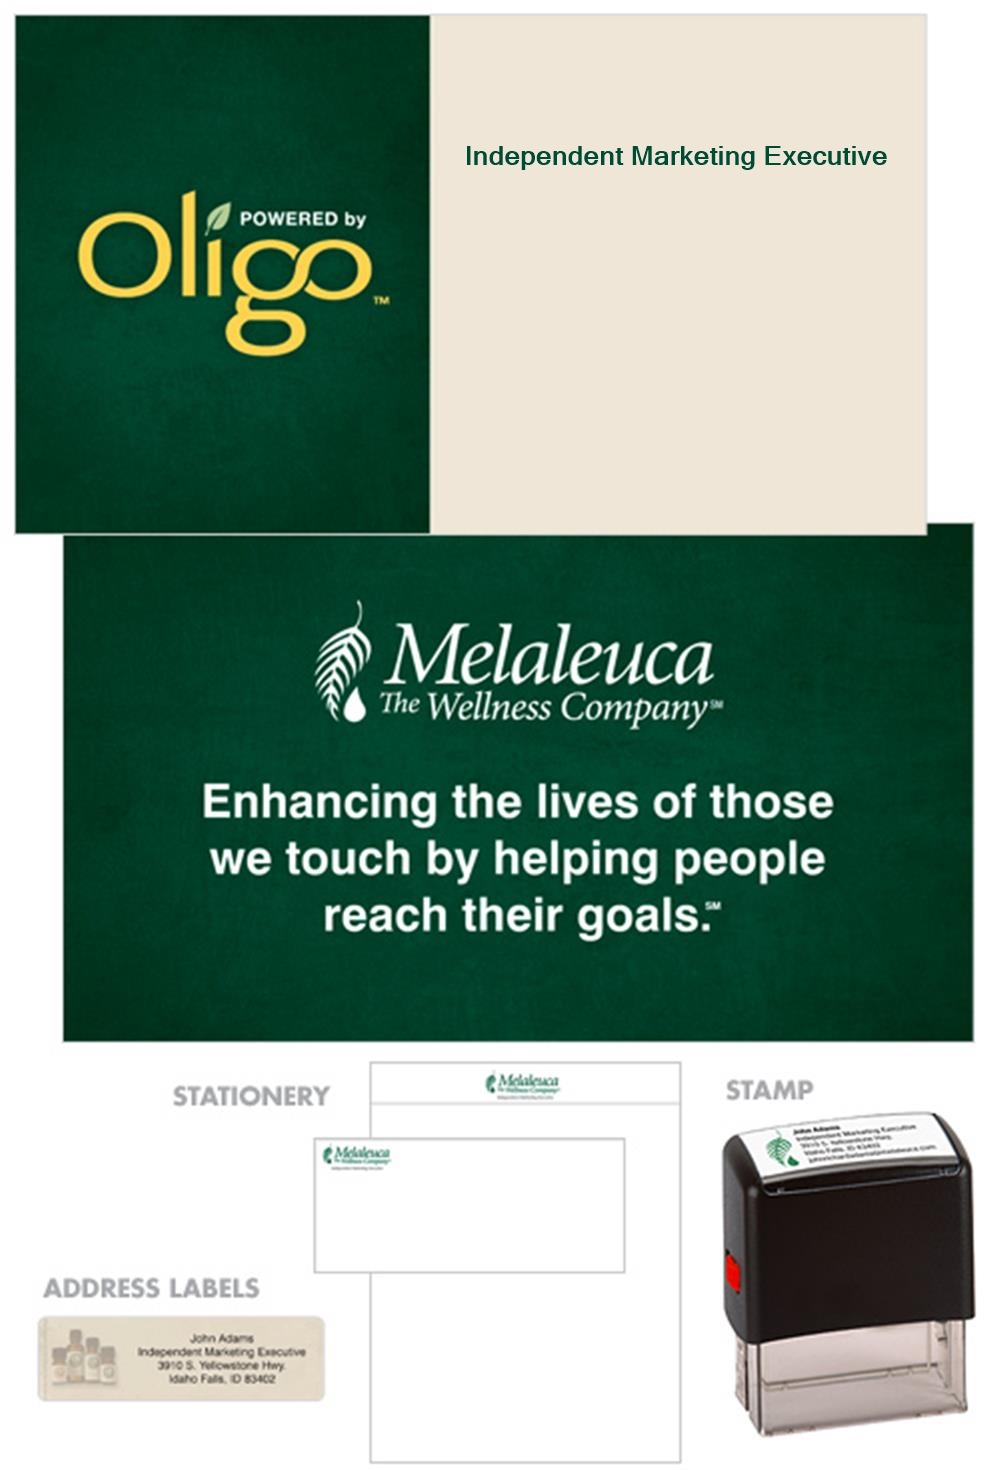 Melaleuca Business Kit - Oligo - Melaleuca